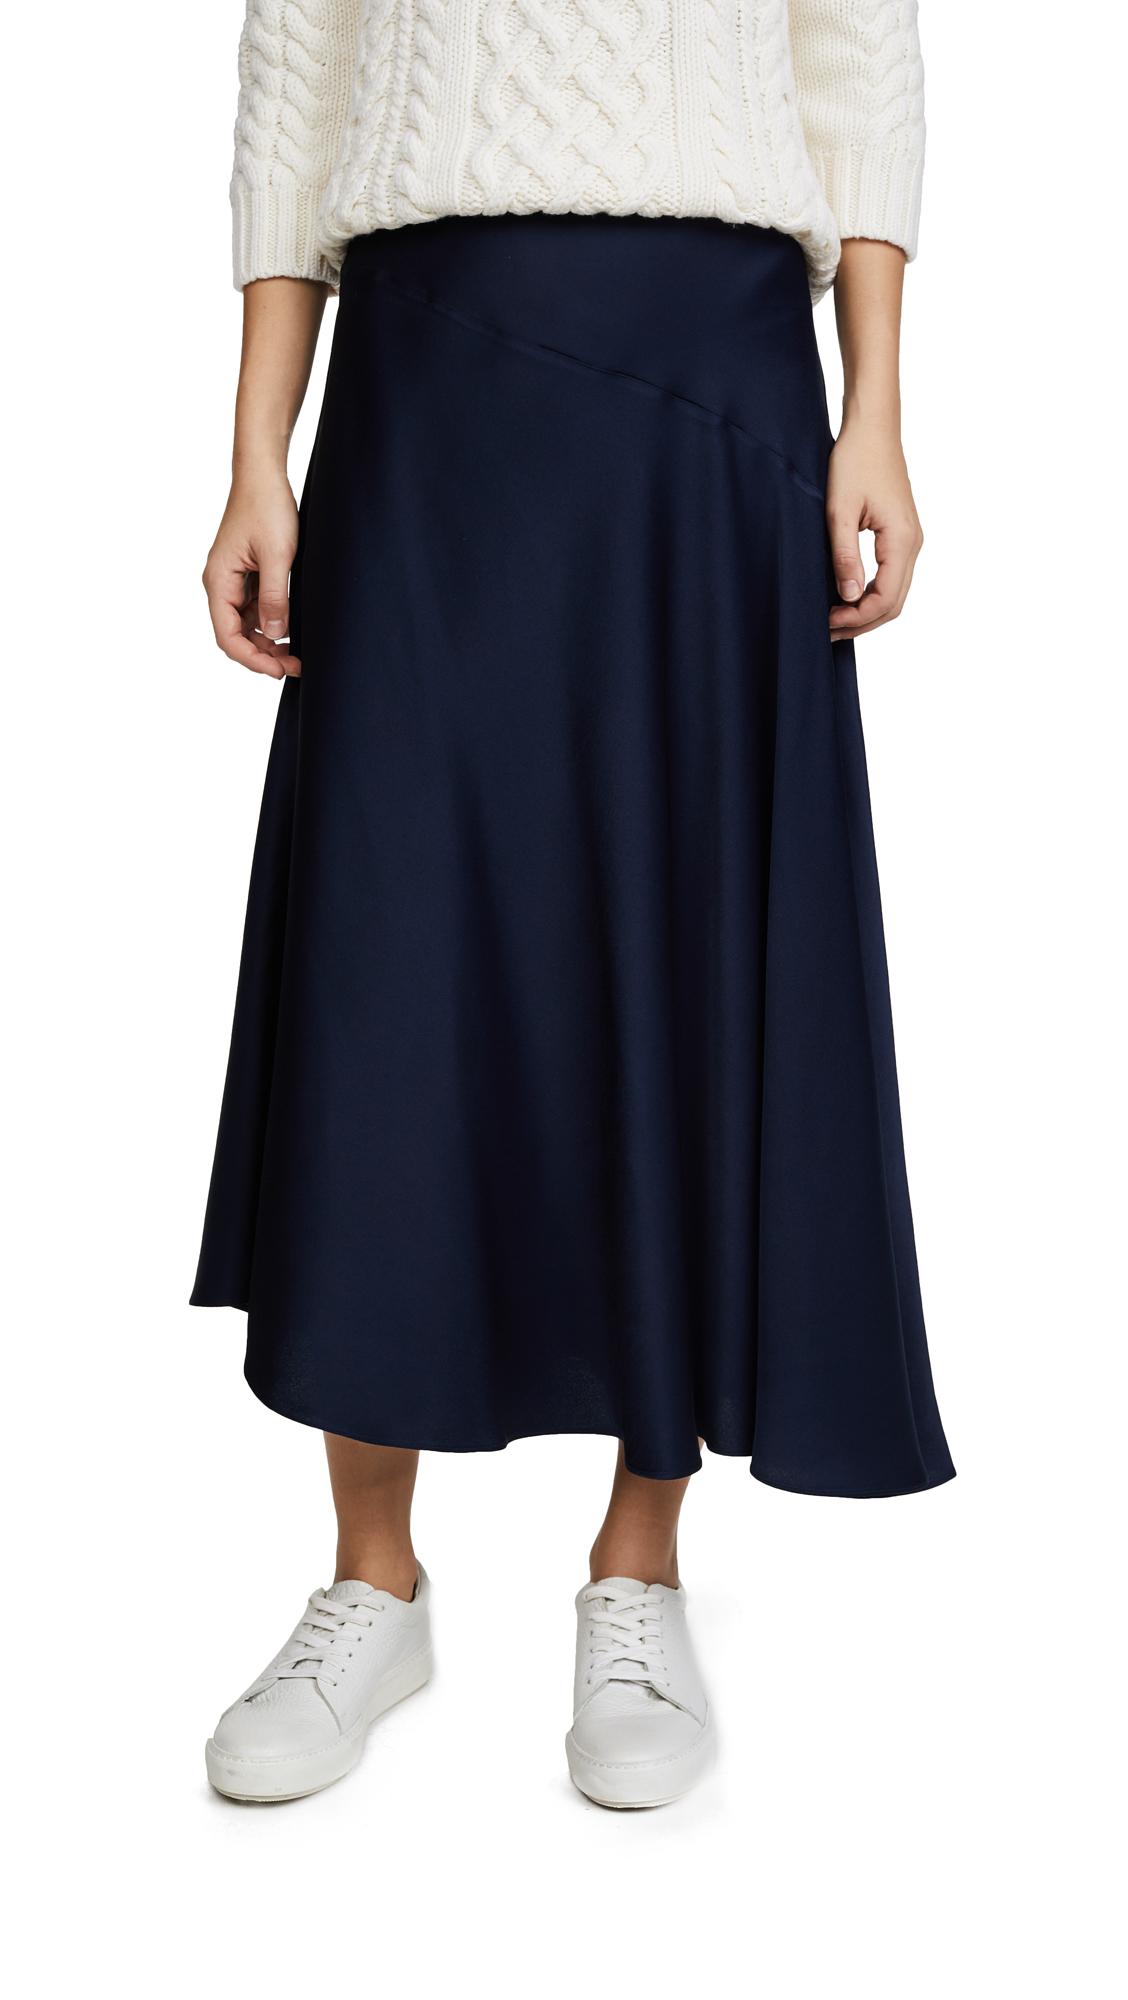 Protagonist Asymmetrical Skirt